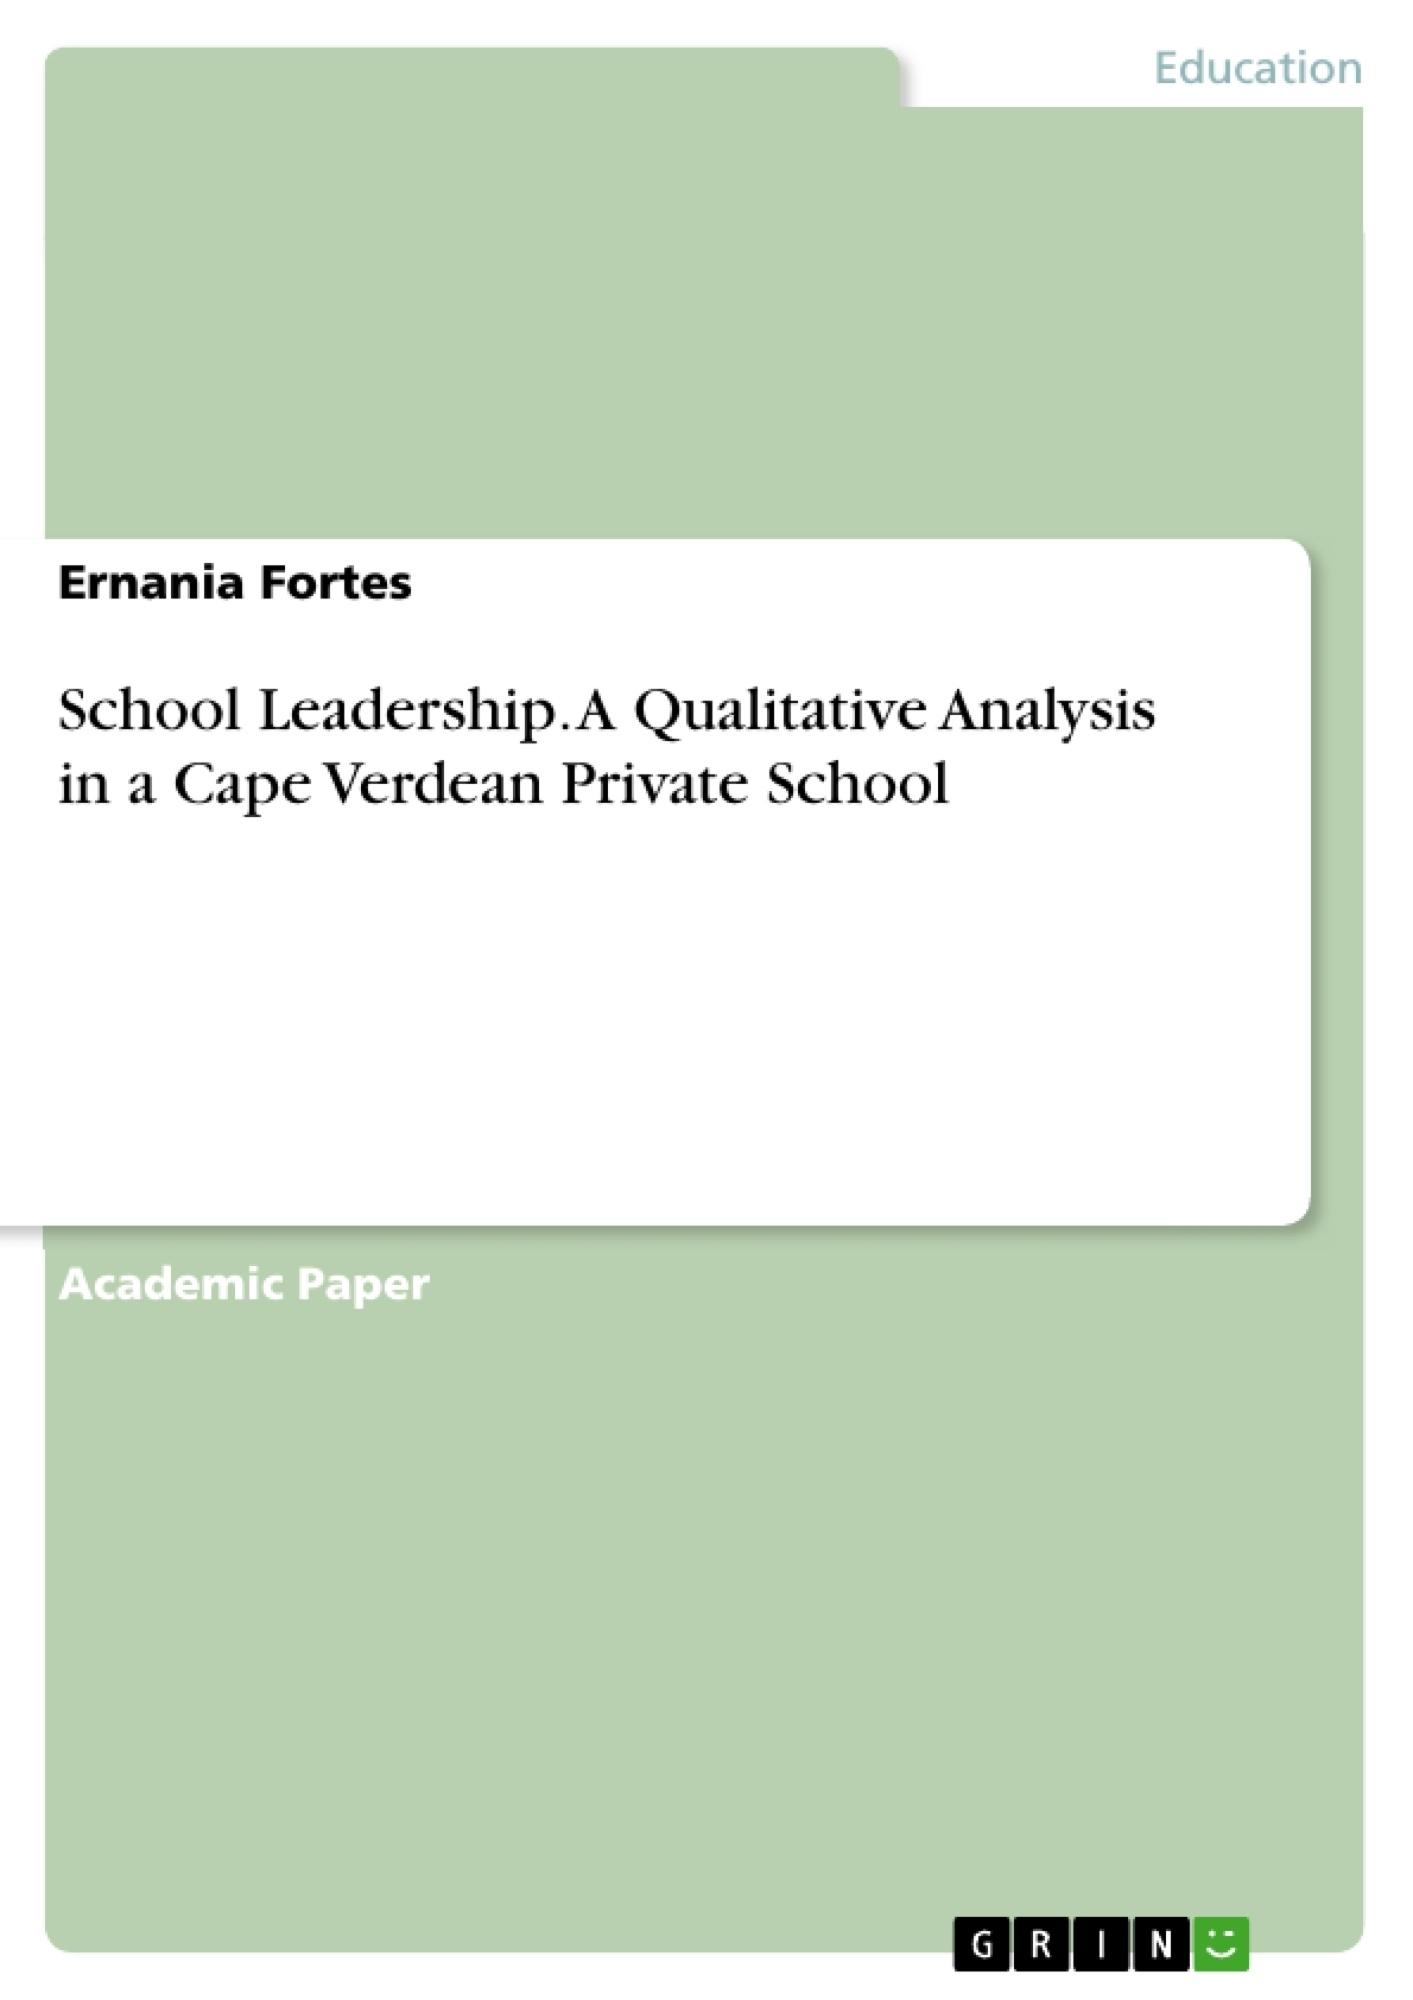 Title: School Leadership. A Qualitative Analysis in a Cape Verdean Private School